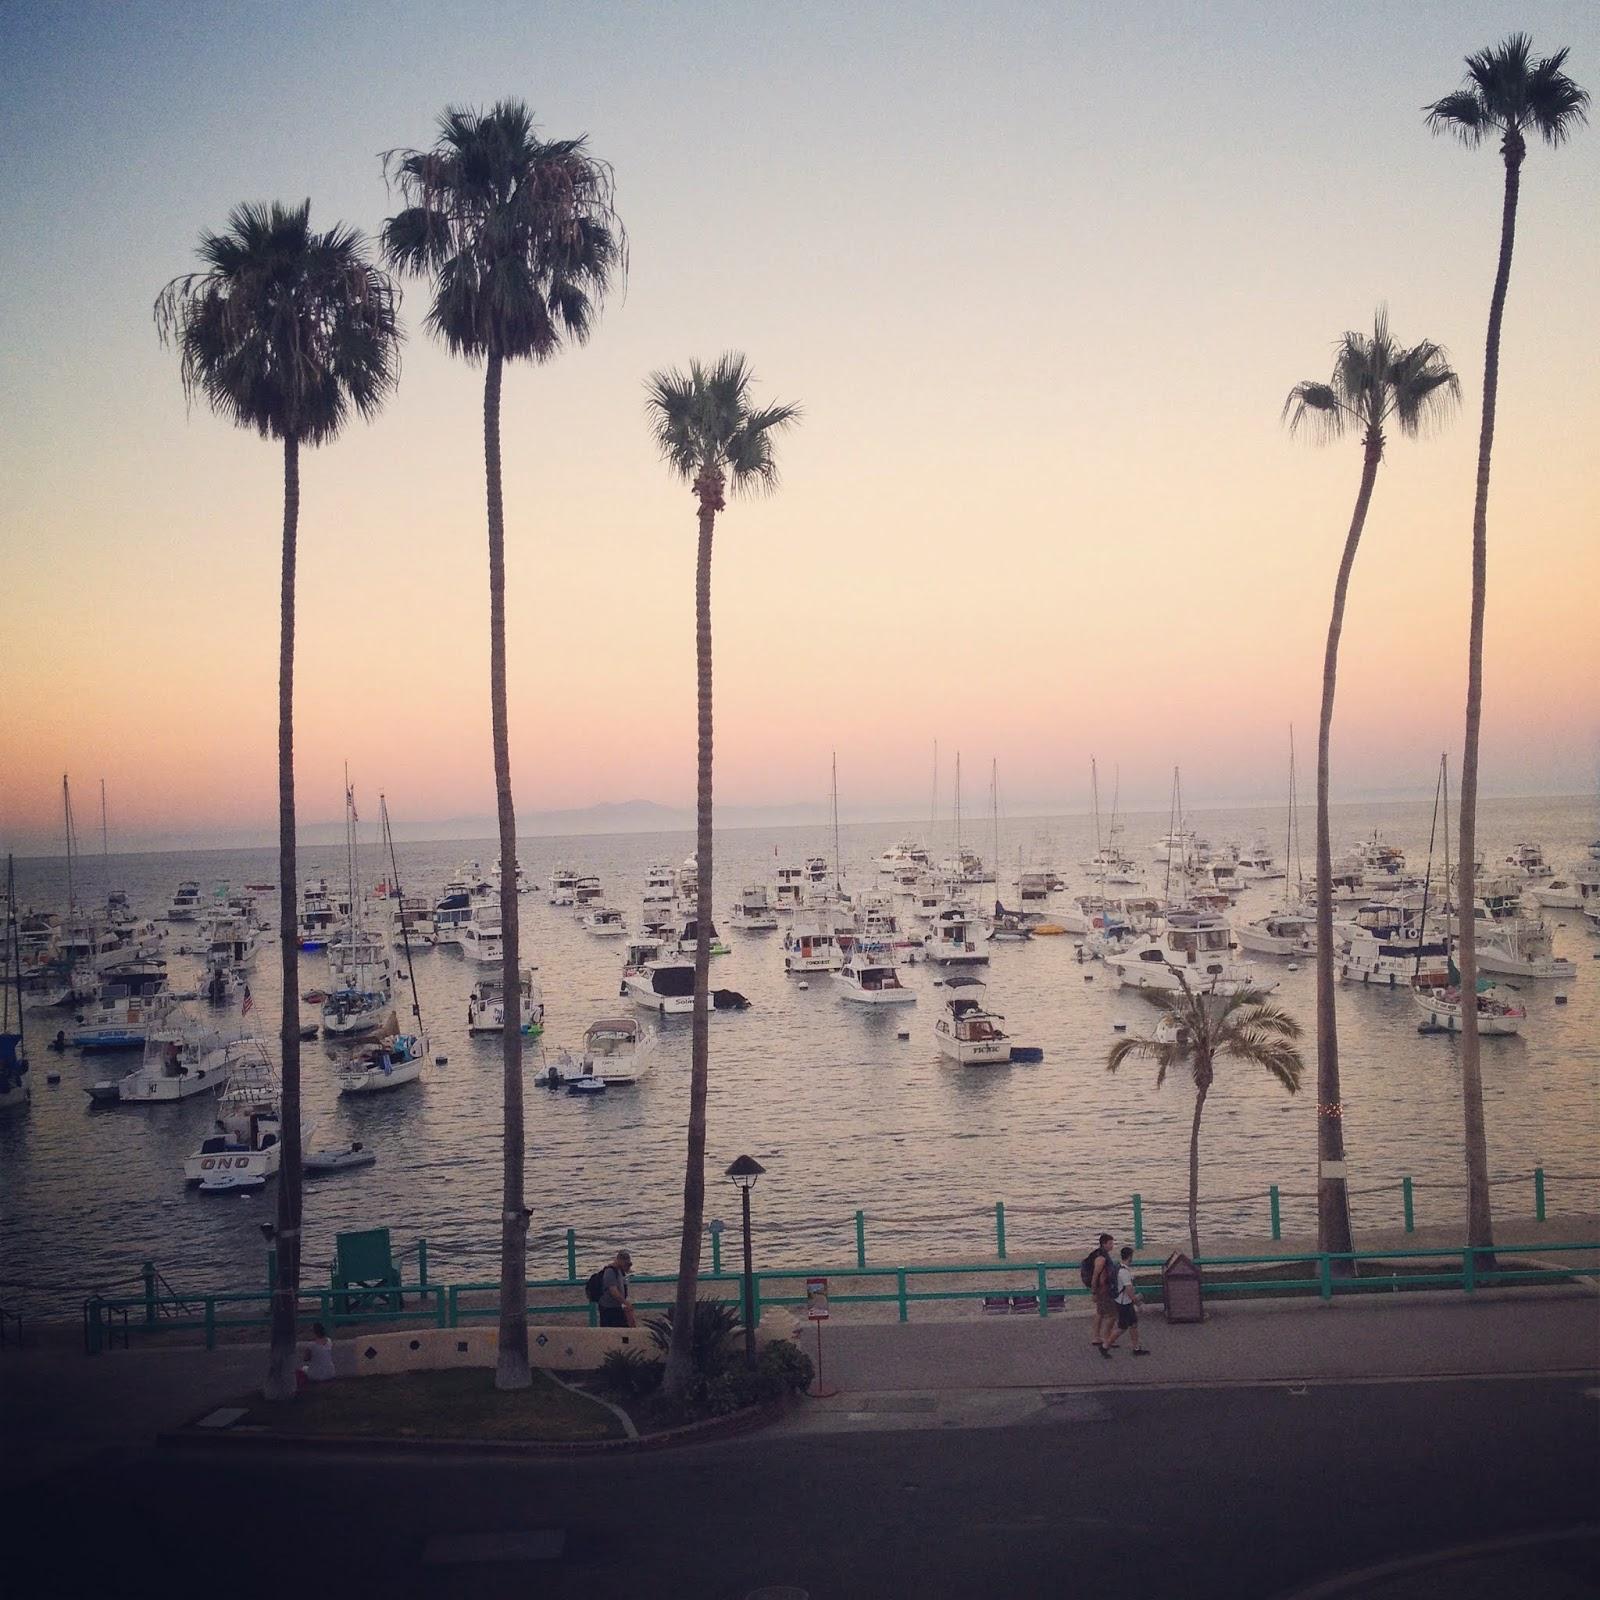 Santa Catalina Island, California